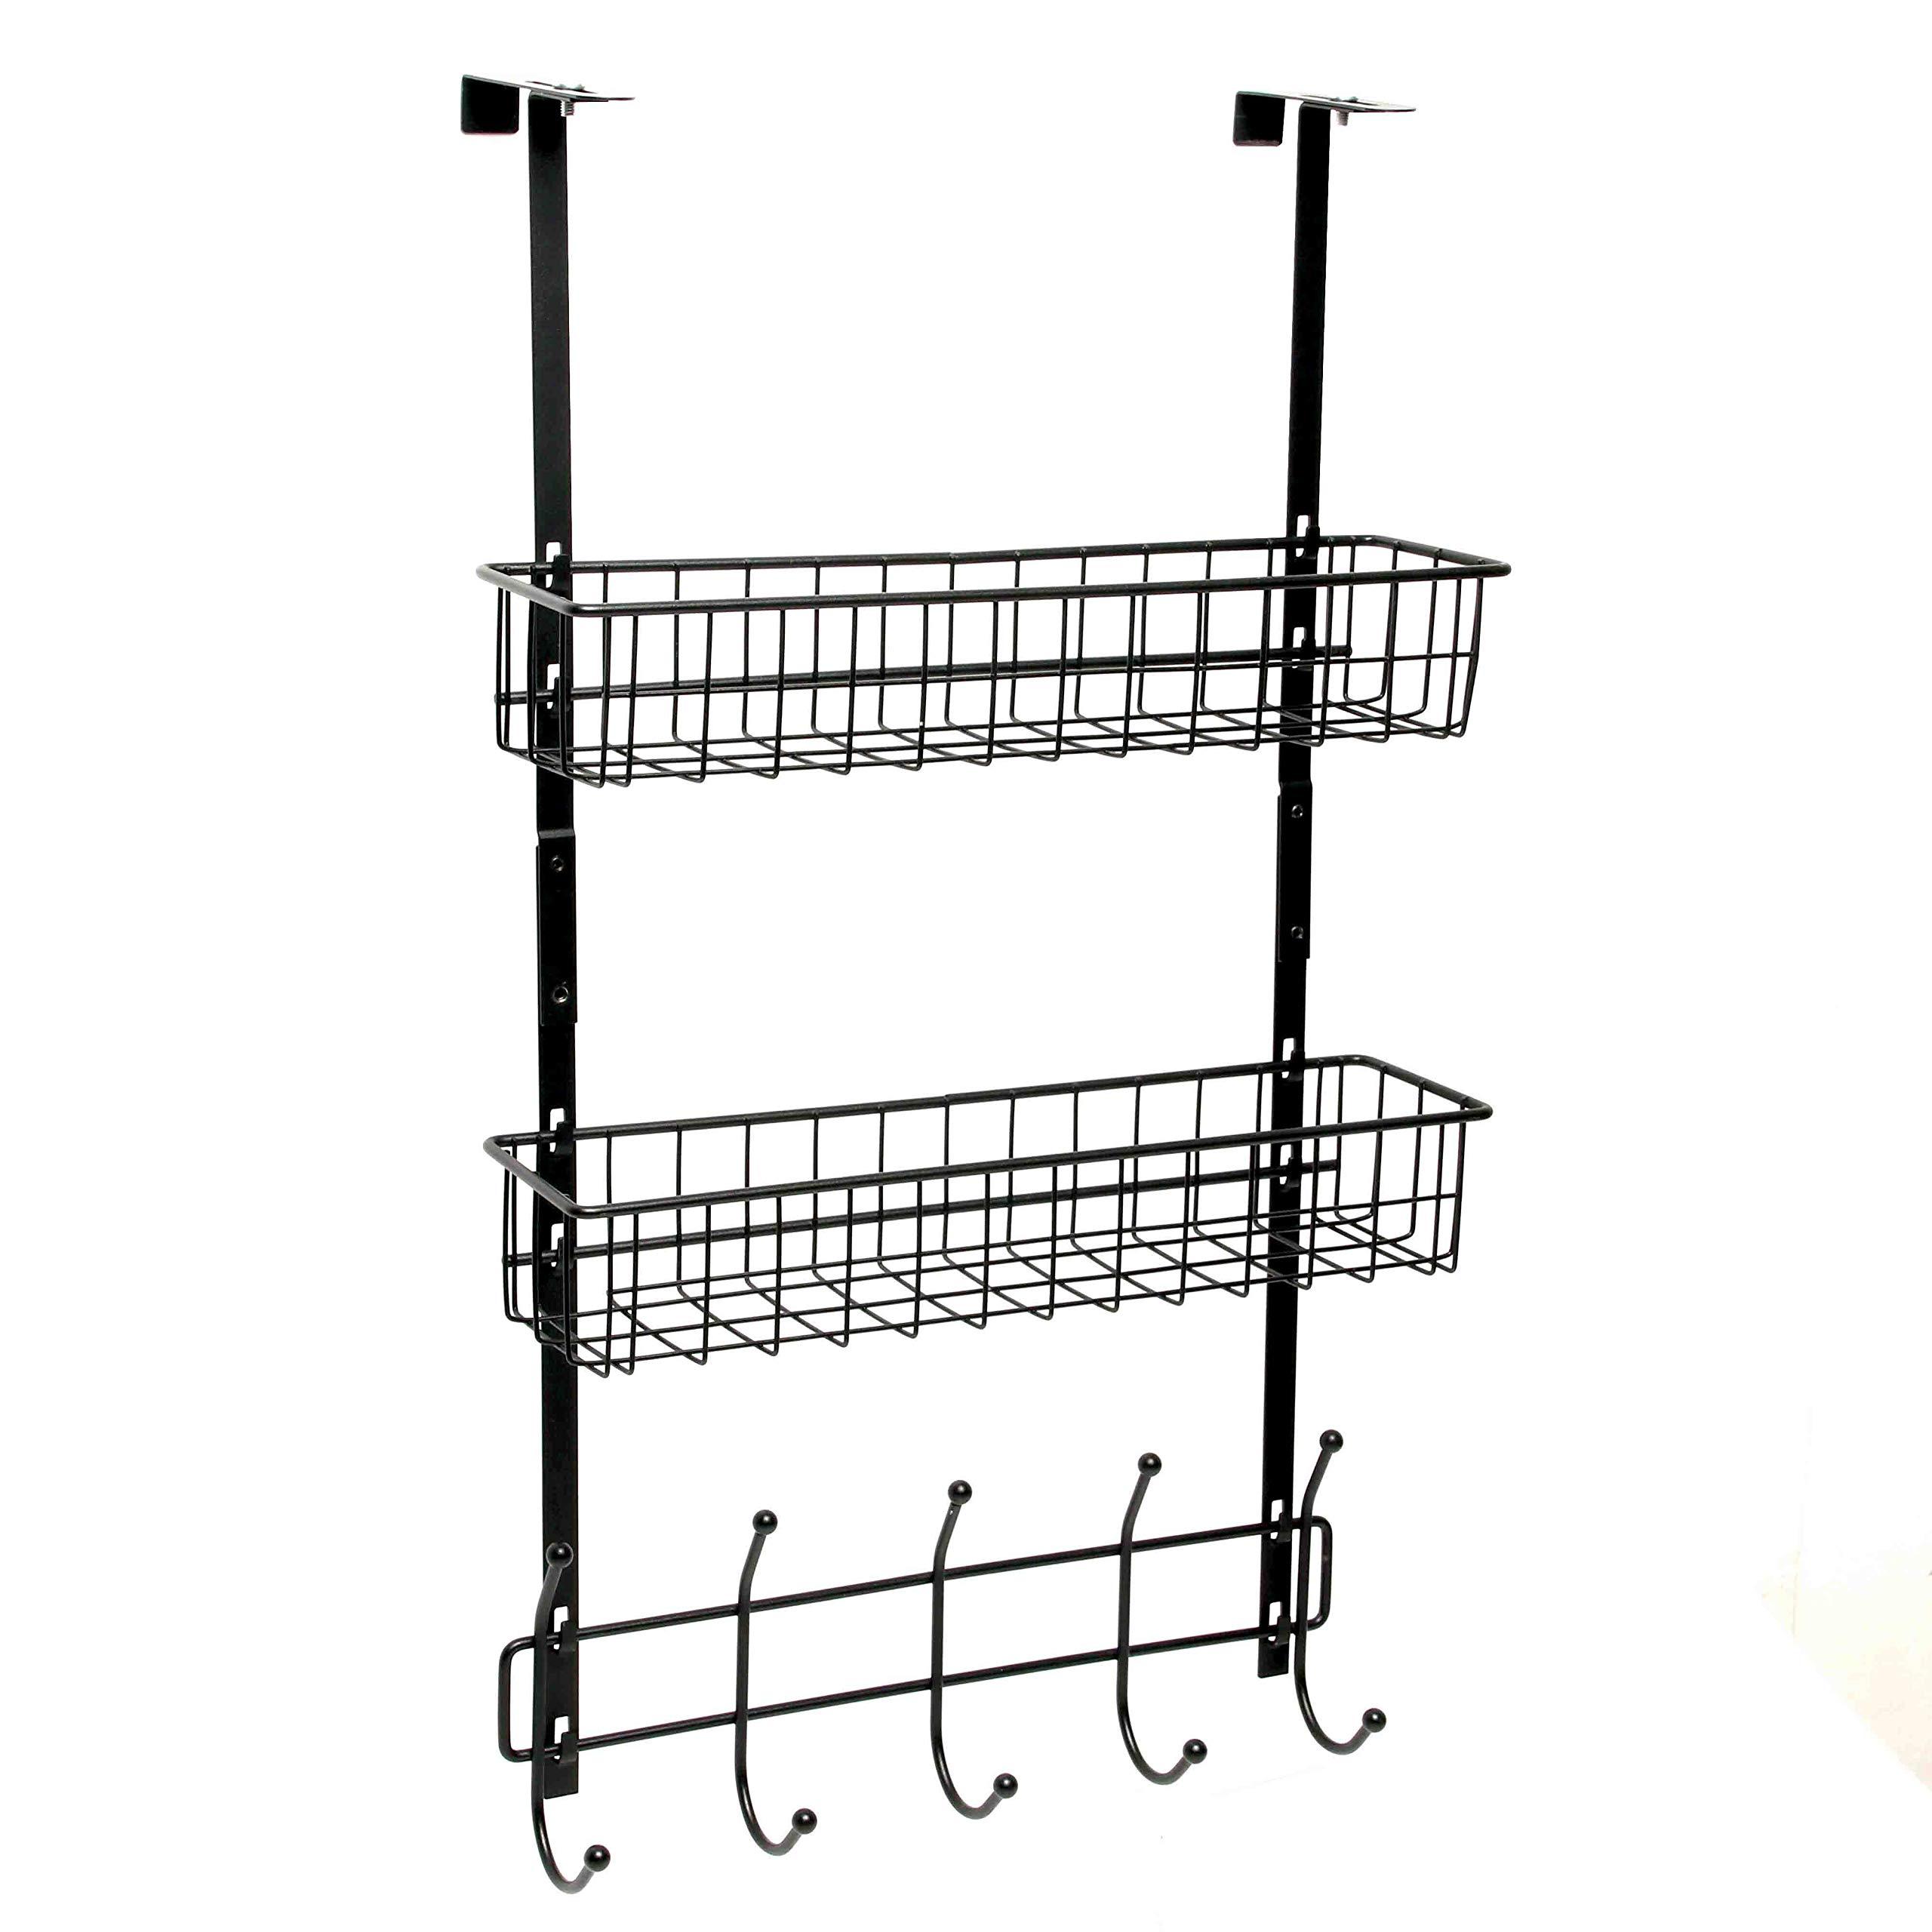 Wittywares Over The Door Hook Hanger Three Tiers with 10 Hooks and Mesh Basket Adjustable Storage Rack Wall Hook for Coats Hats Robes Towels